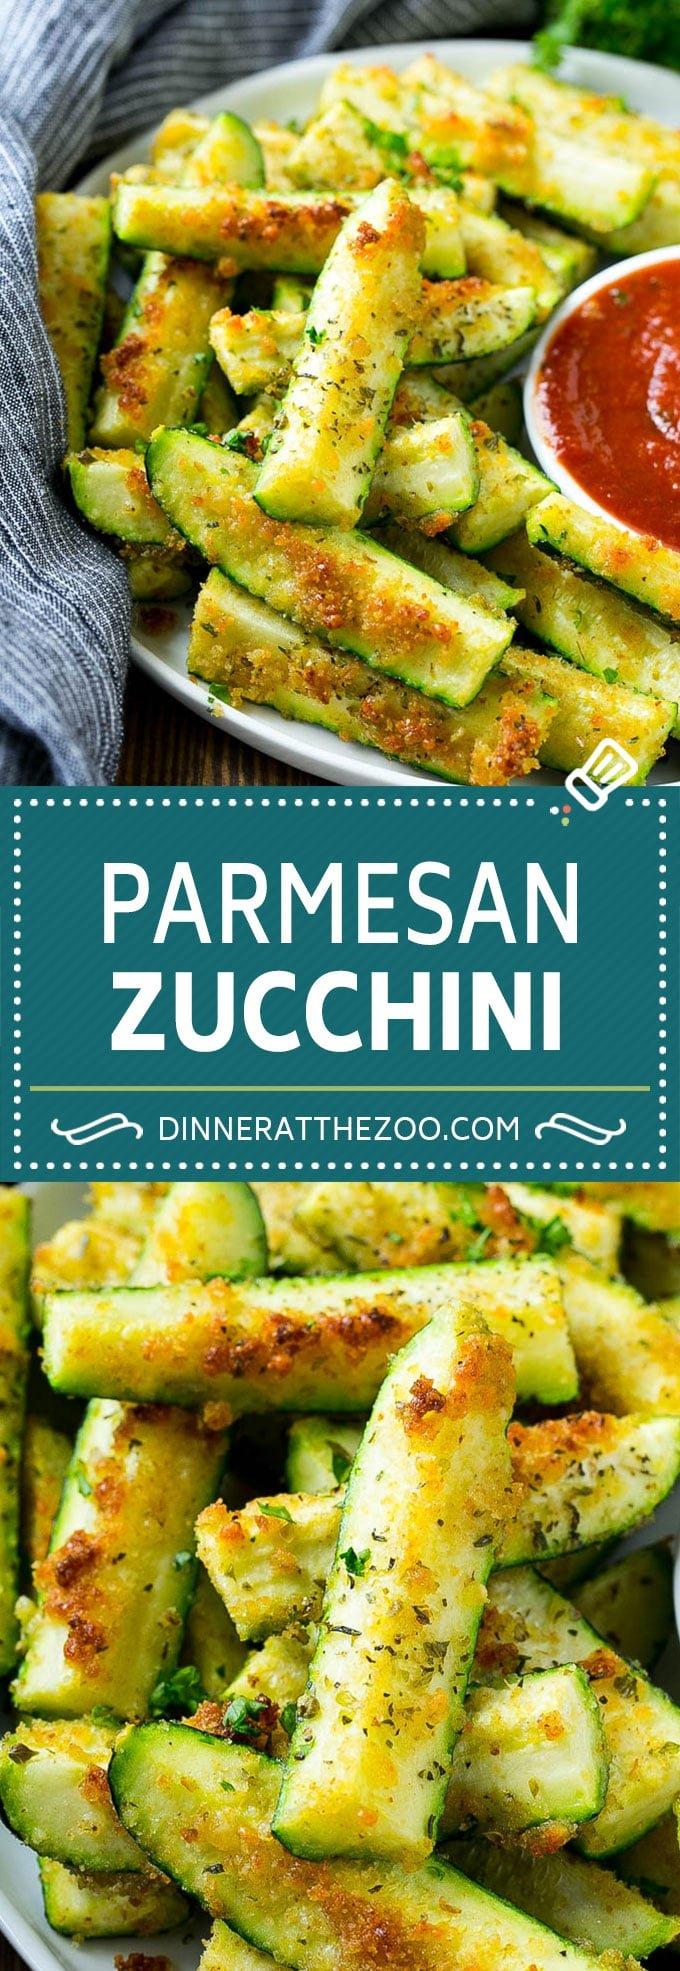 Parmesan Zucchini Recipe | Roasted Zucchini | Baked Zucchini | Zucchini Side Dish #zucchini #parmesan #sidedish #dinner #dinneratthezoo